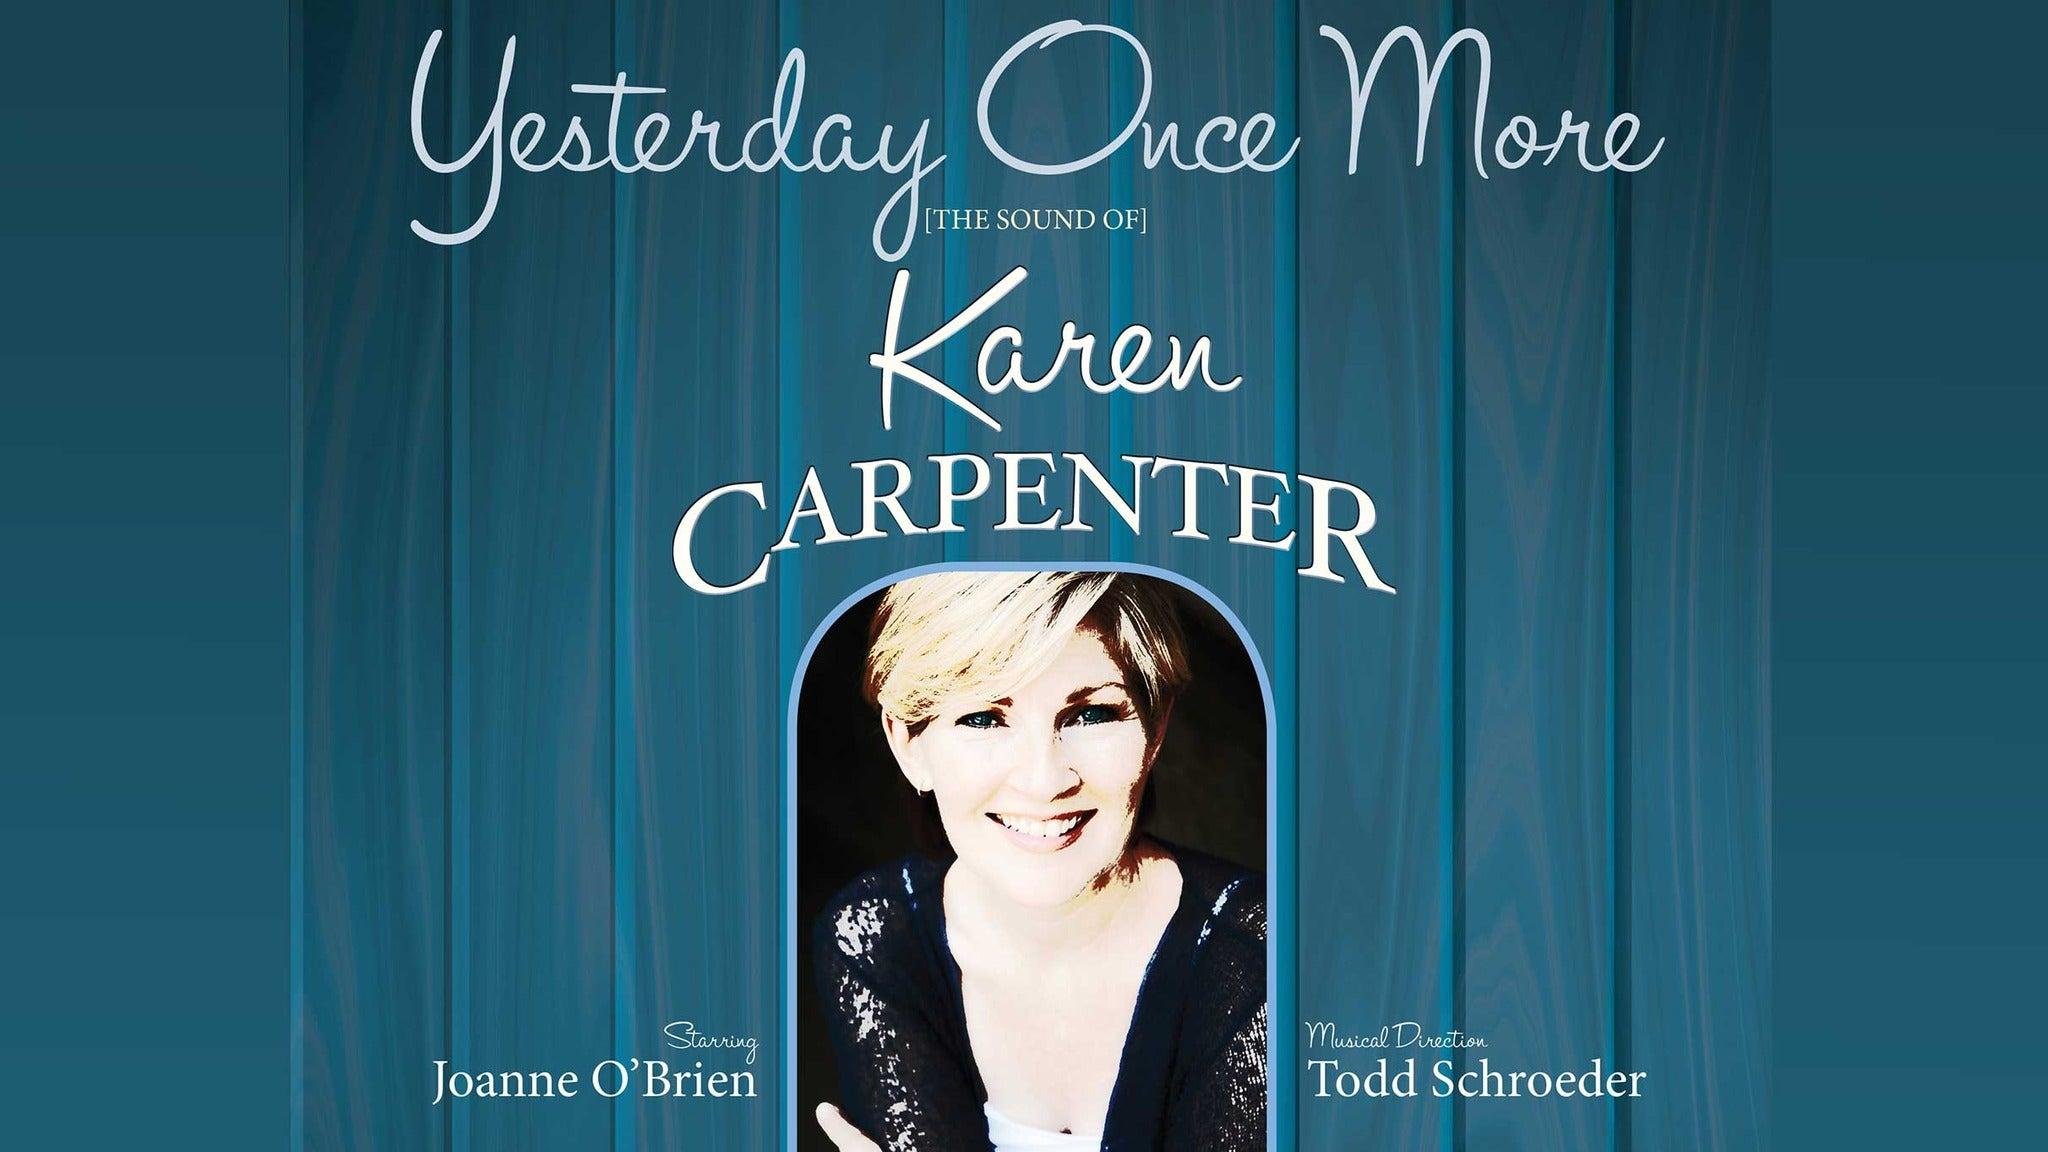 Yesterday Once More: The Sound of Karen Carpenter - Aventura, FL 33180